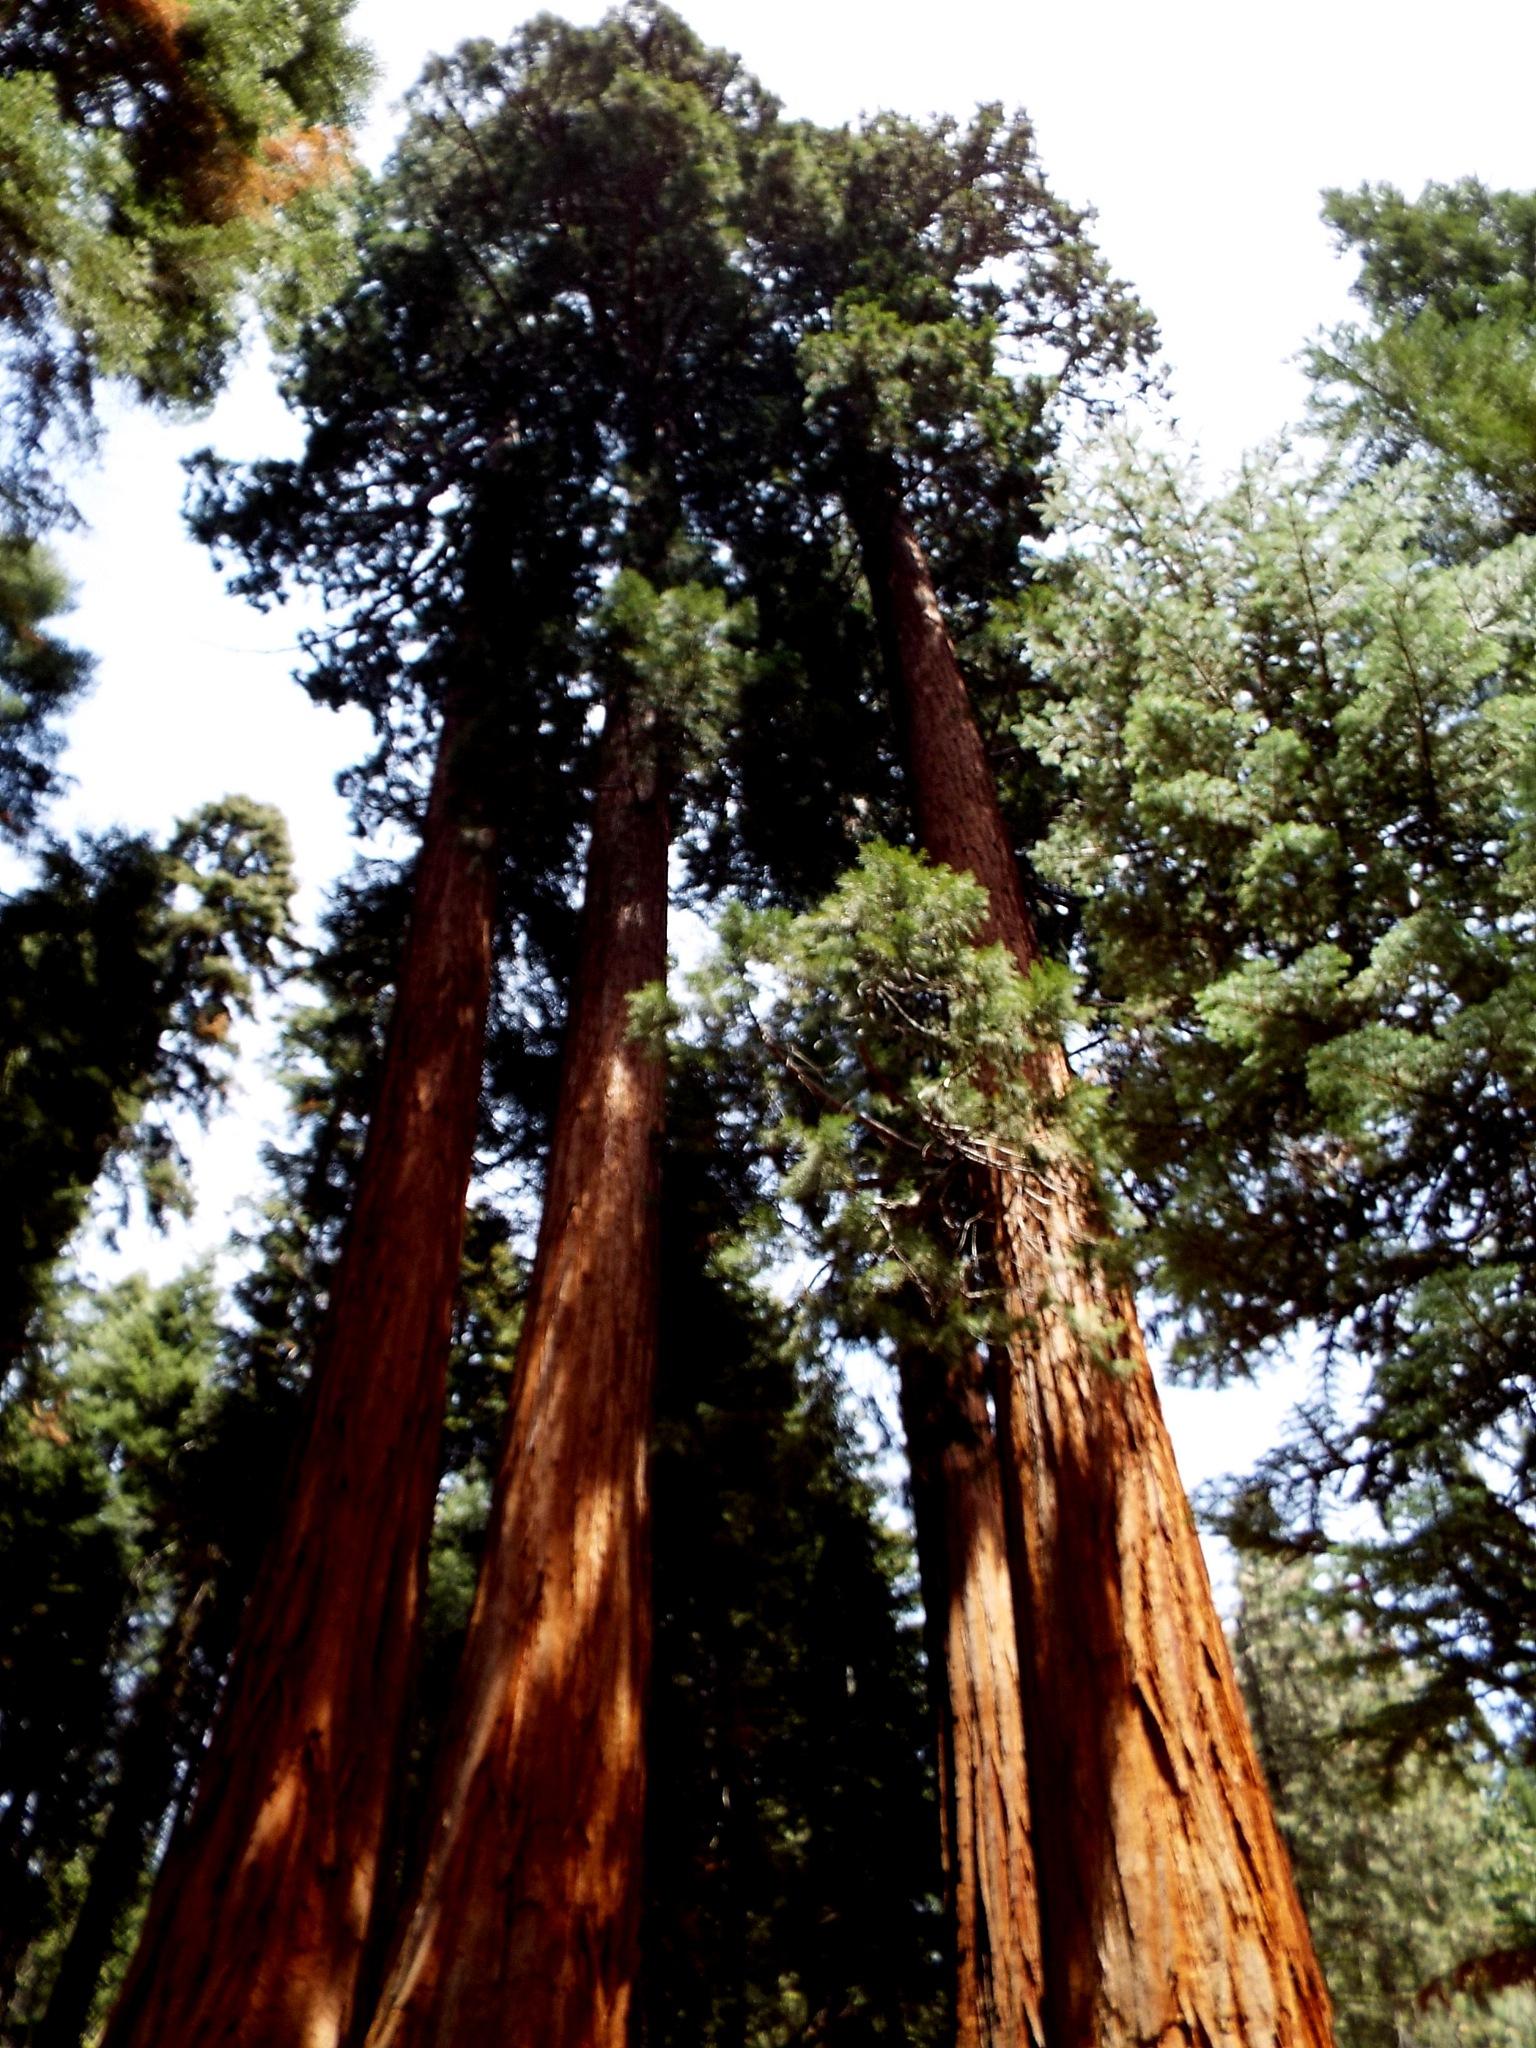 GIANT SEQUOIA TREES, SPRINGVILLE, CA USA by Akin Saner